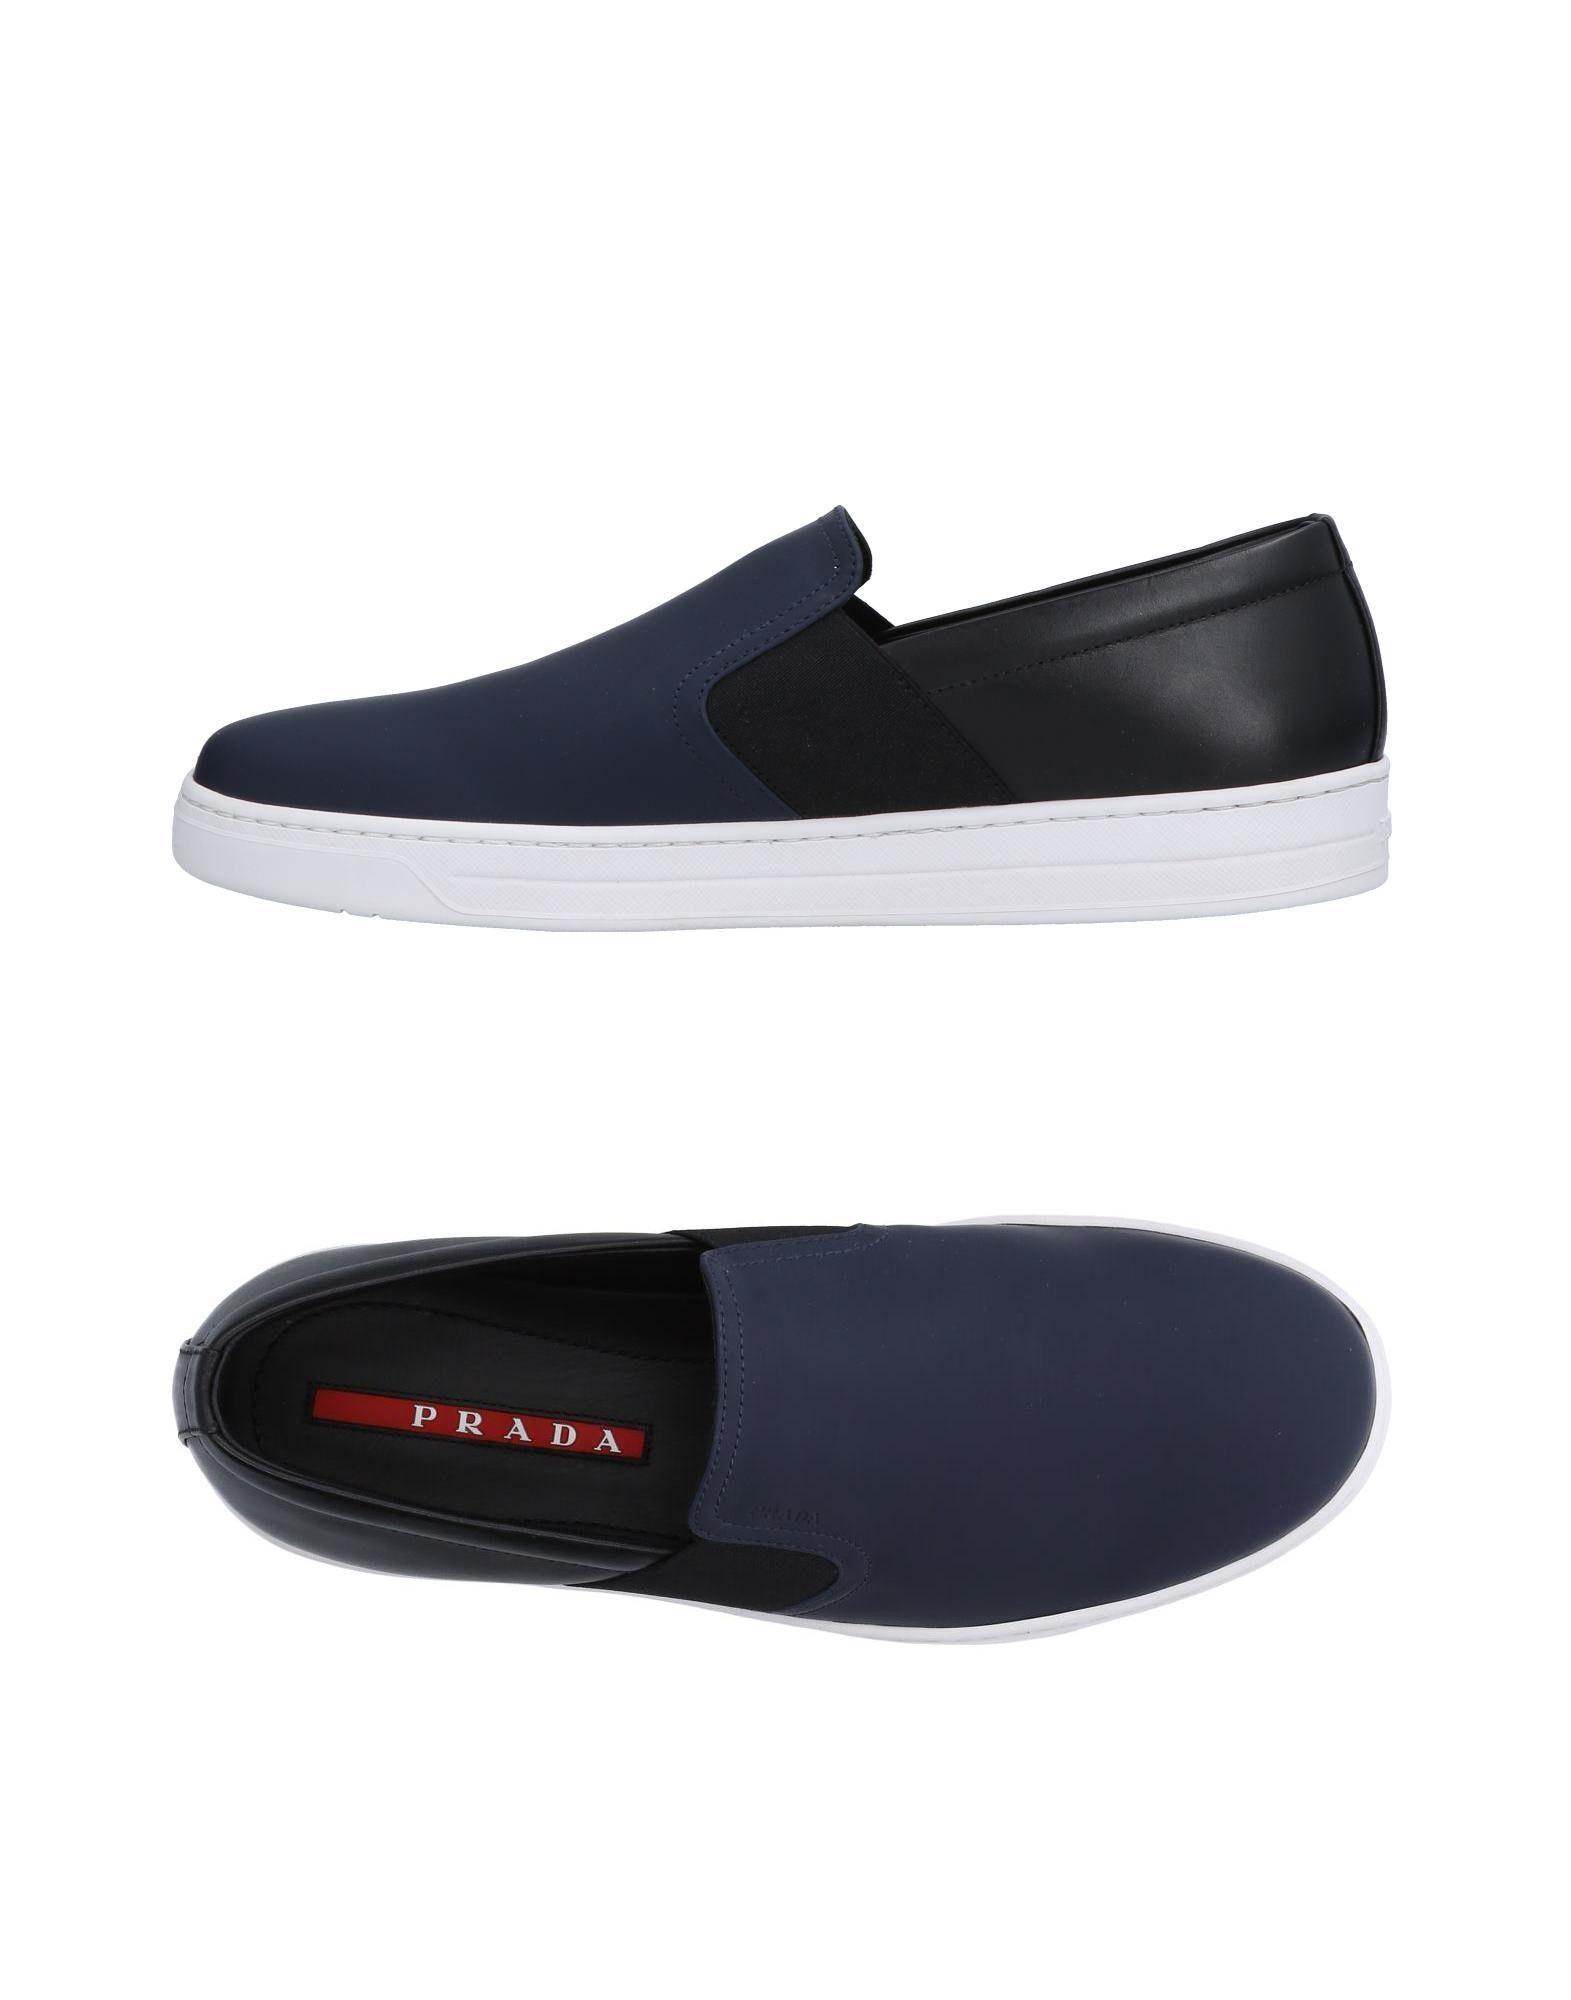 Prada Sport Mokassins Herren  11503671CU Gute Qualität beliebte Schuhe